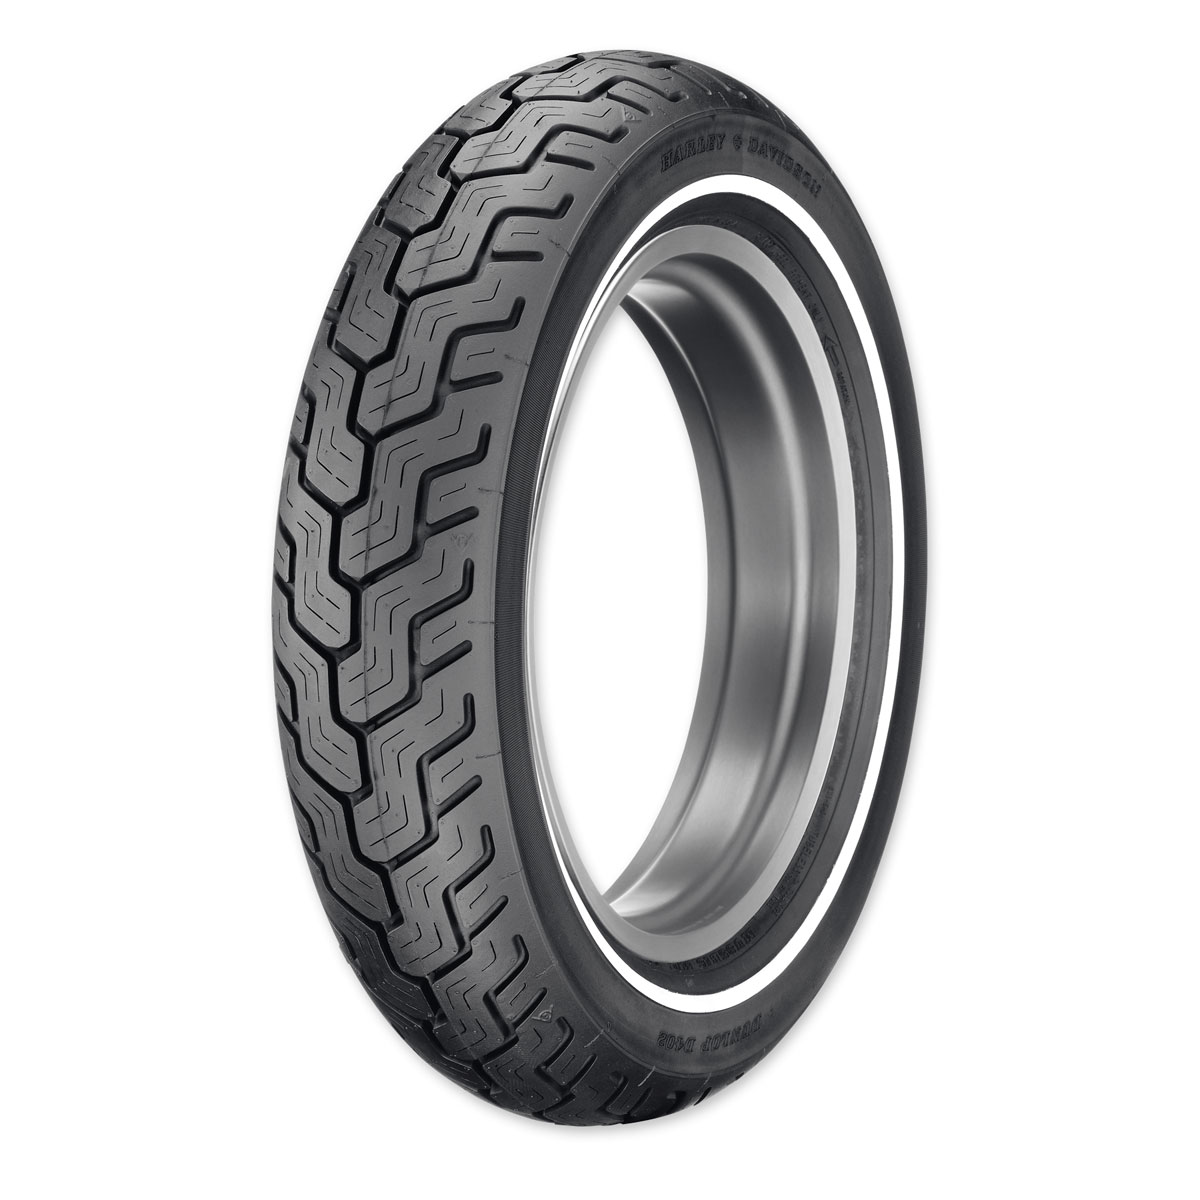 Dunlop D402 MU85B16 Narrow Whitewall Rear Tire